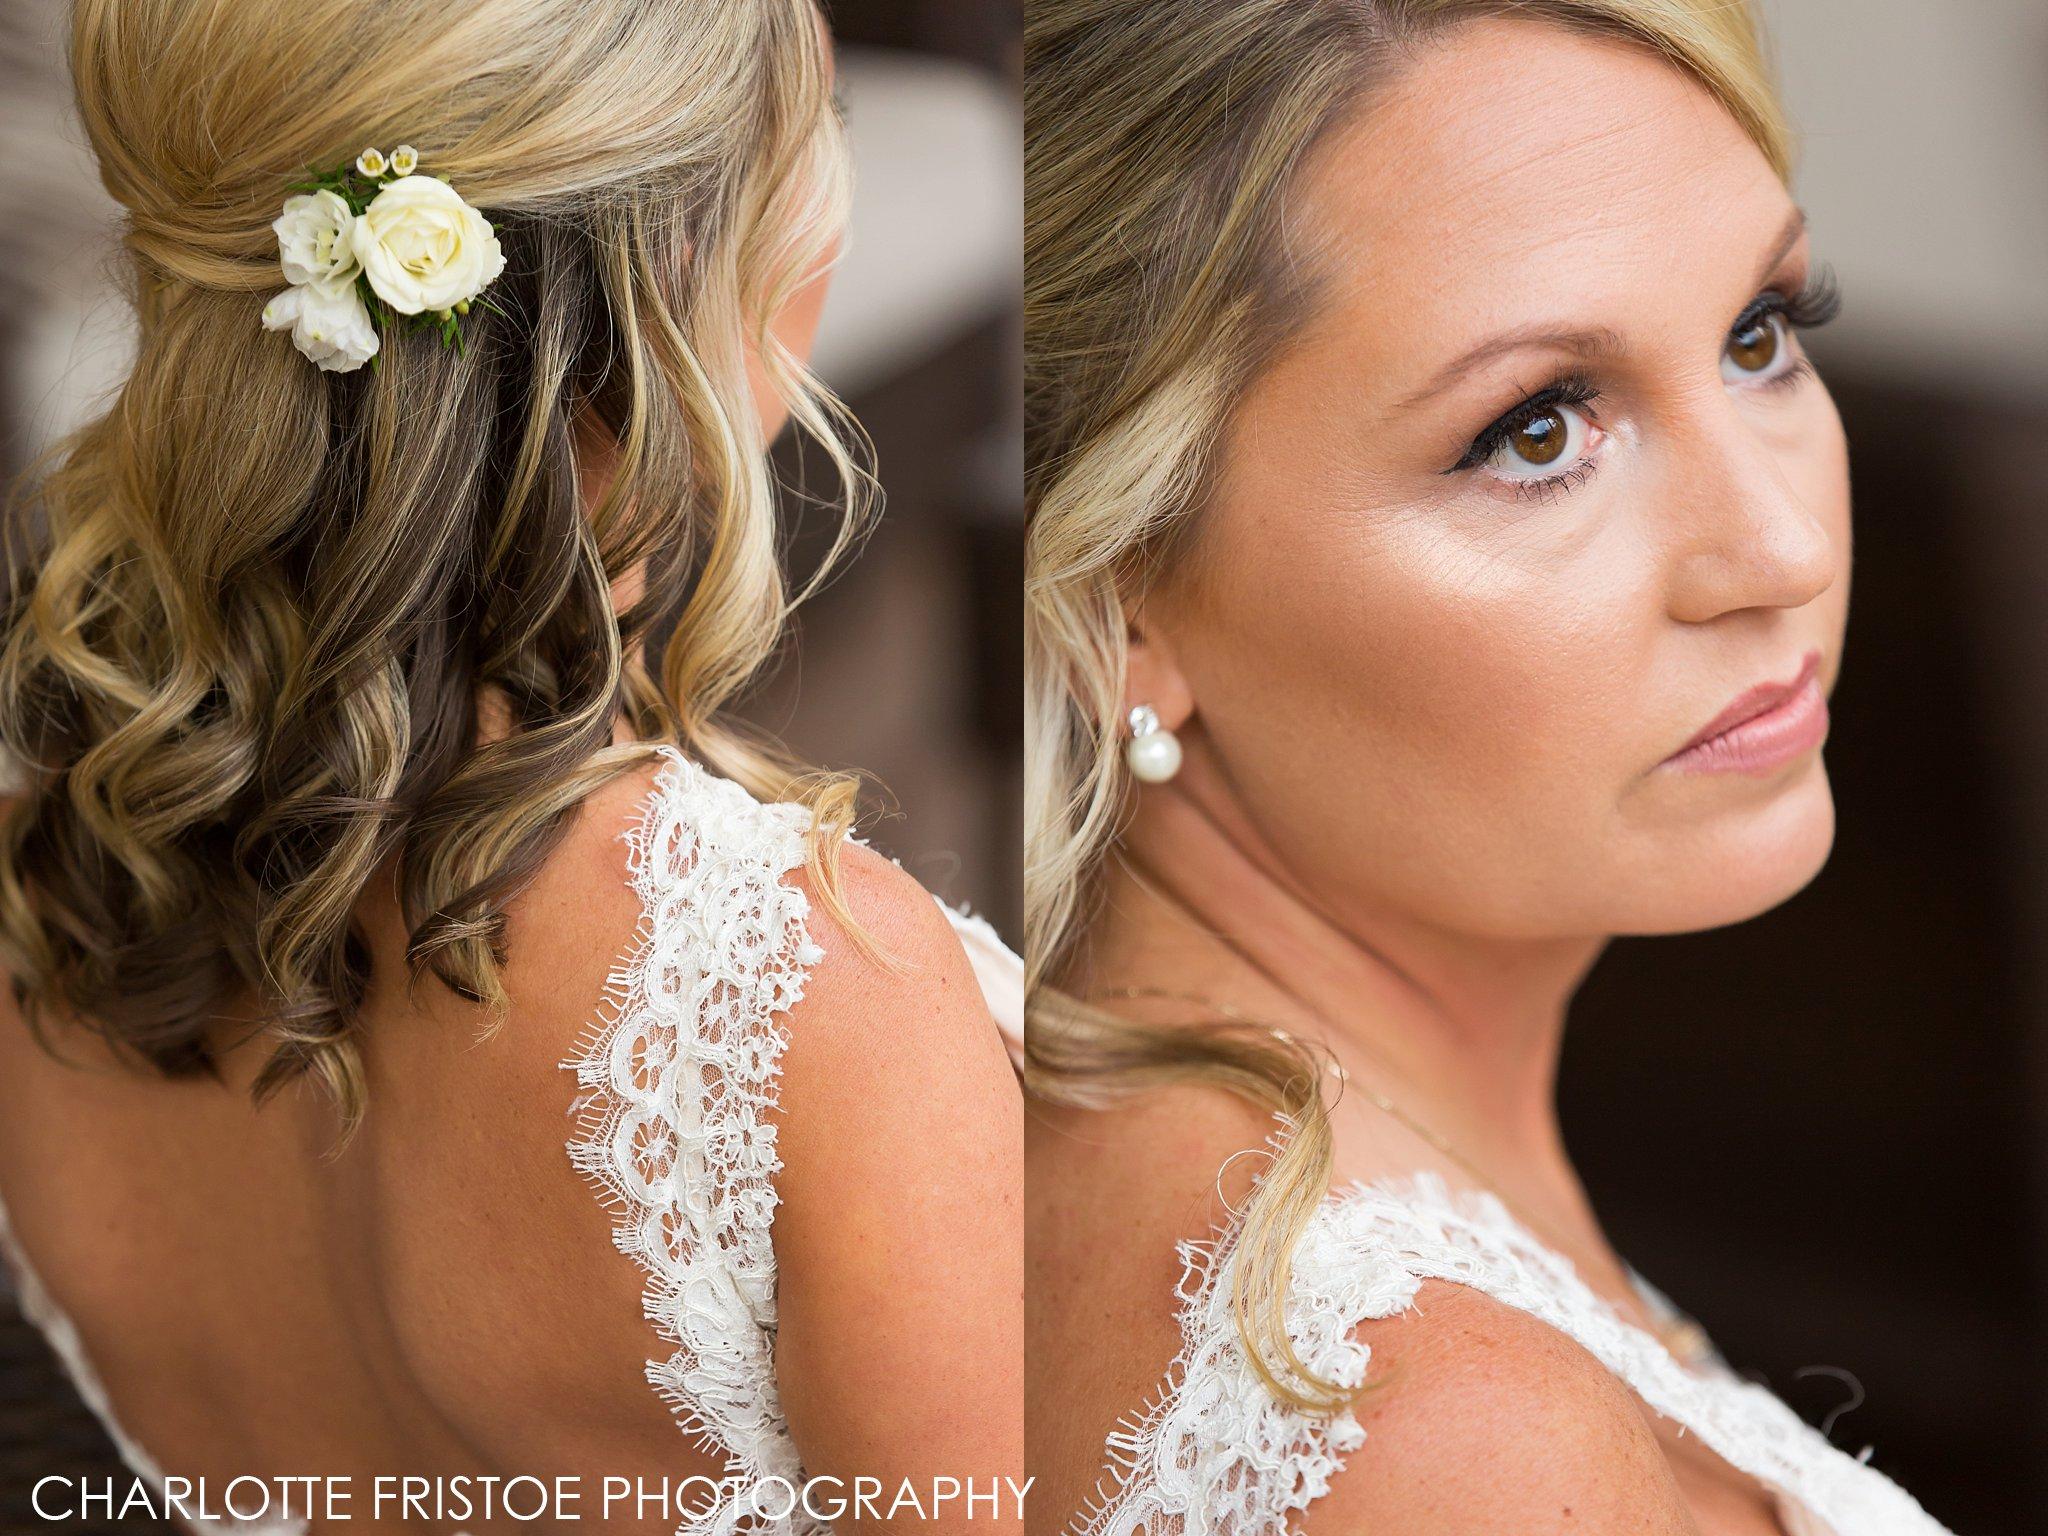 Charlotte Fristoe Photography-31.jpg